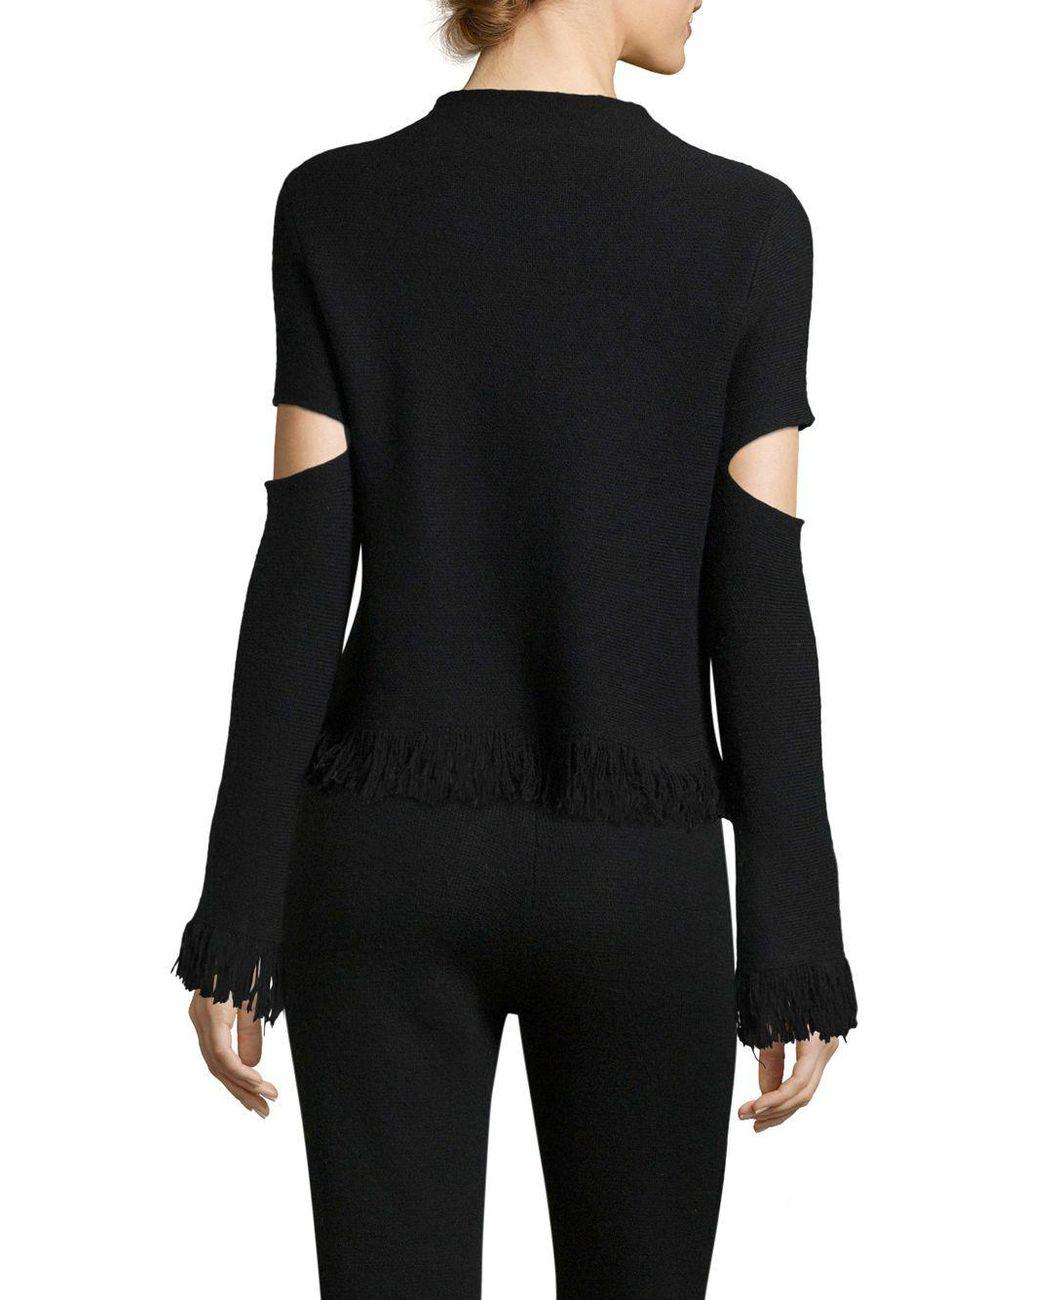 8c139c6ce911 Lyst - Zoe Jordan Laplace High-neck Sweater in Black - Save 61%